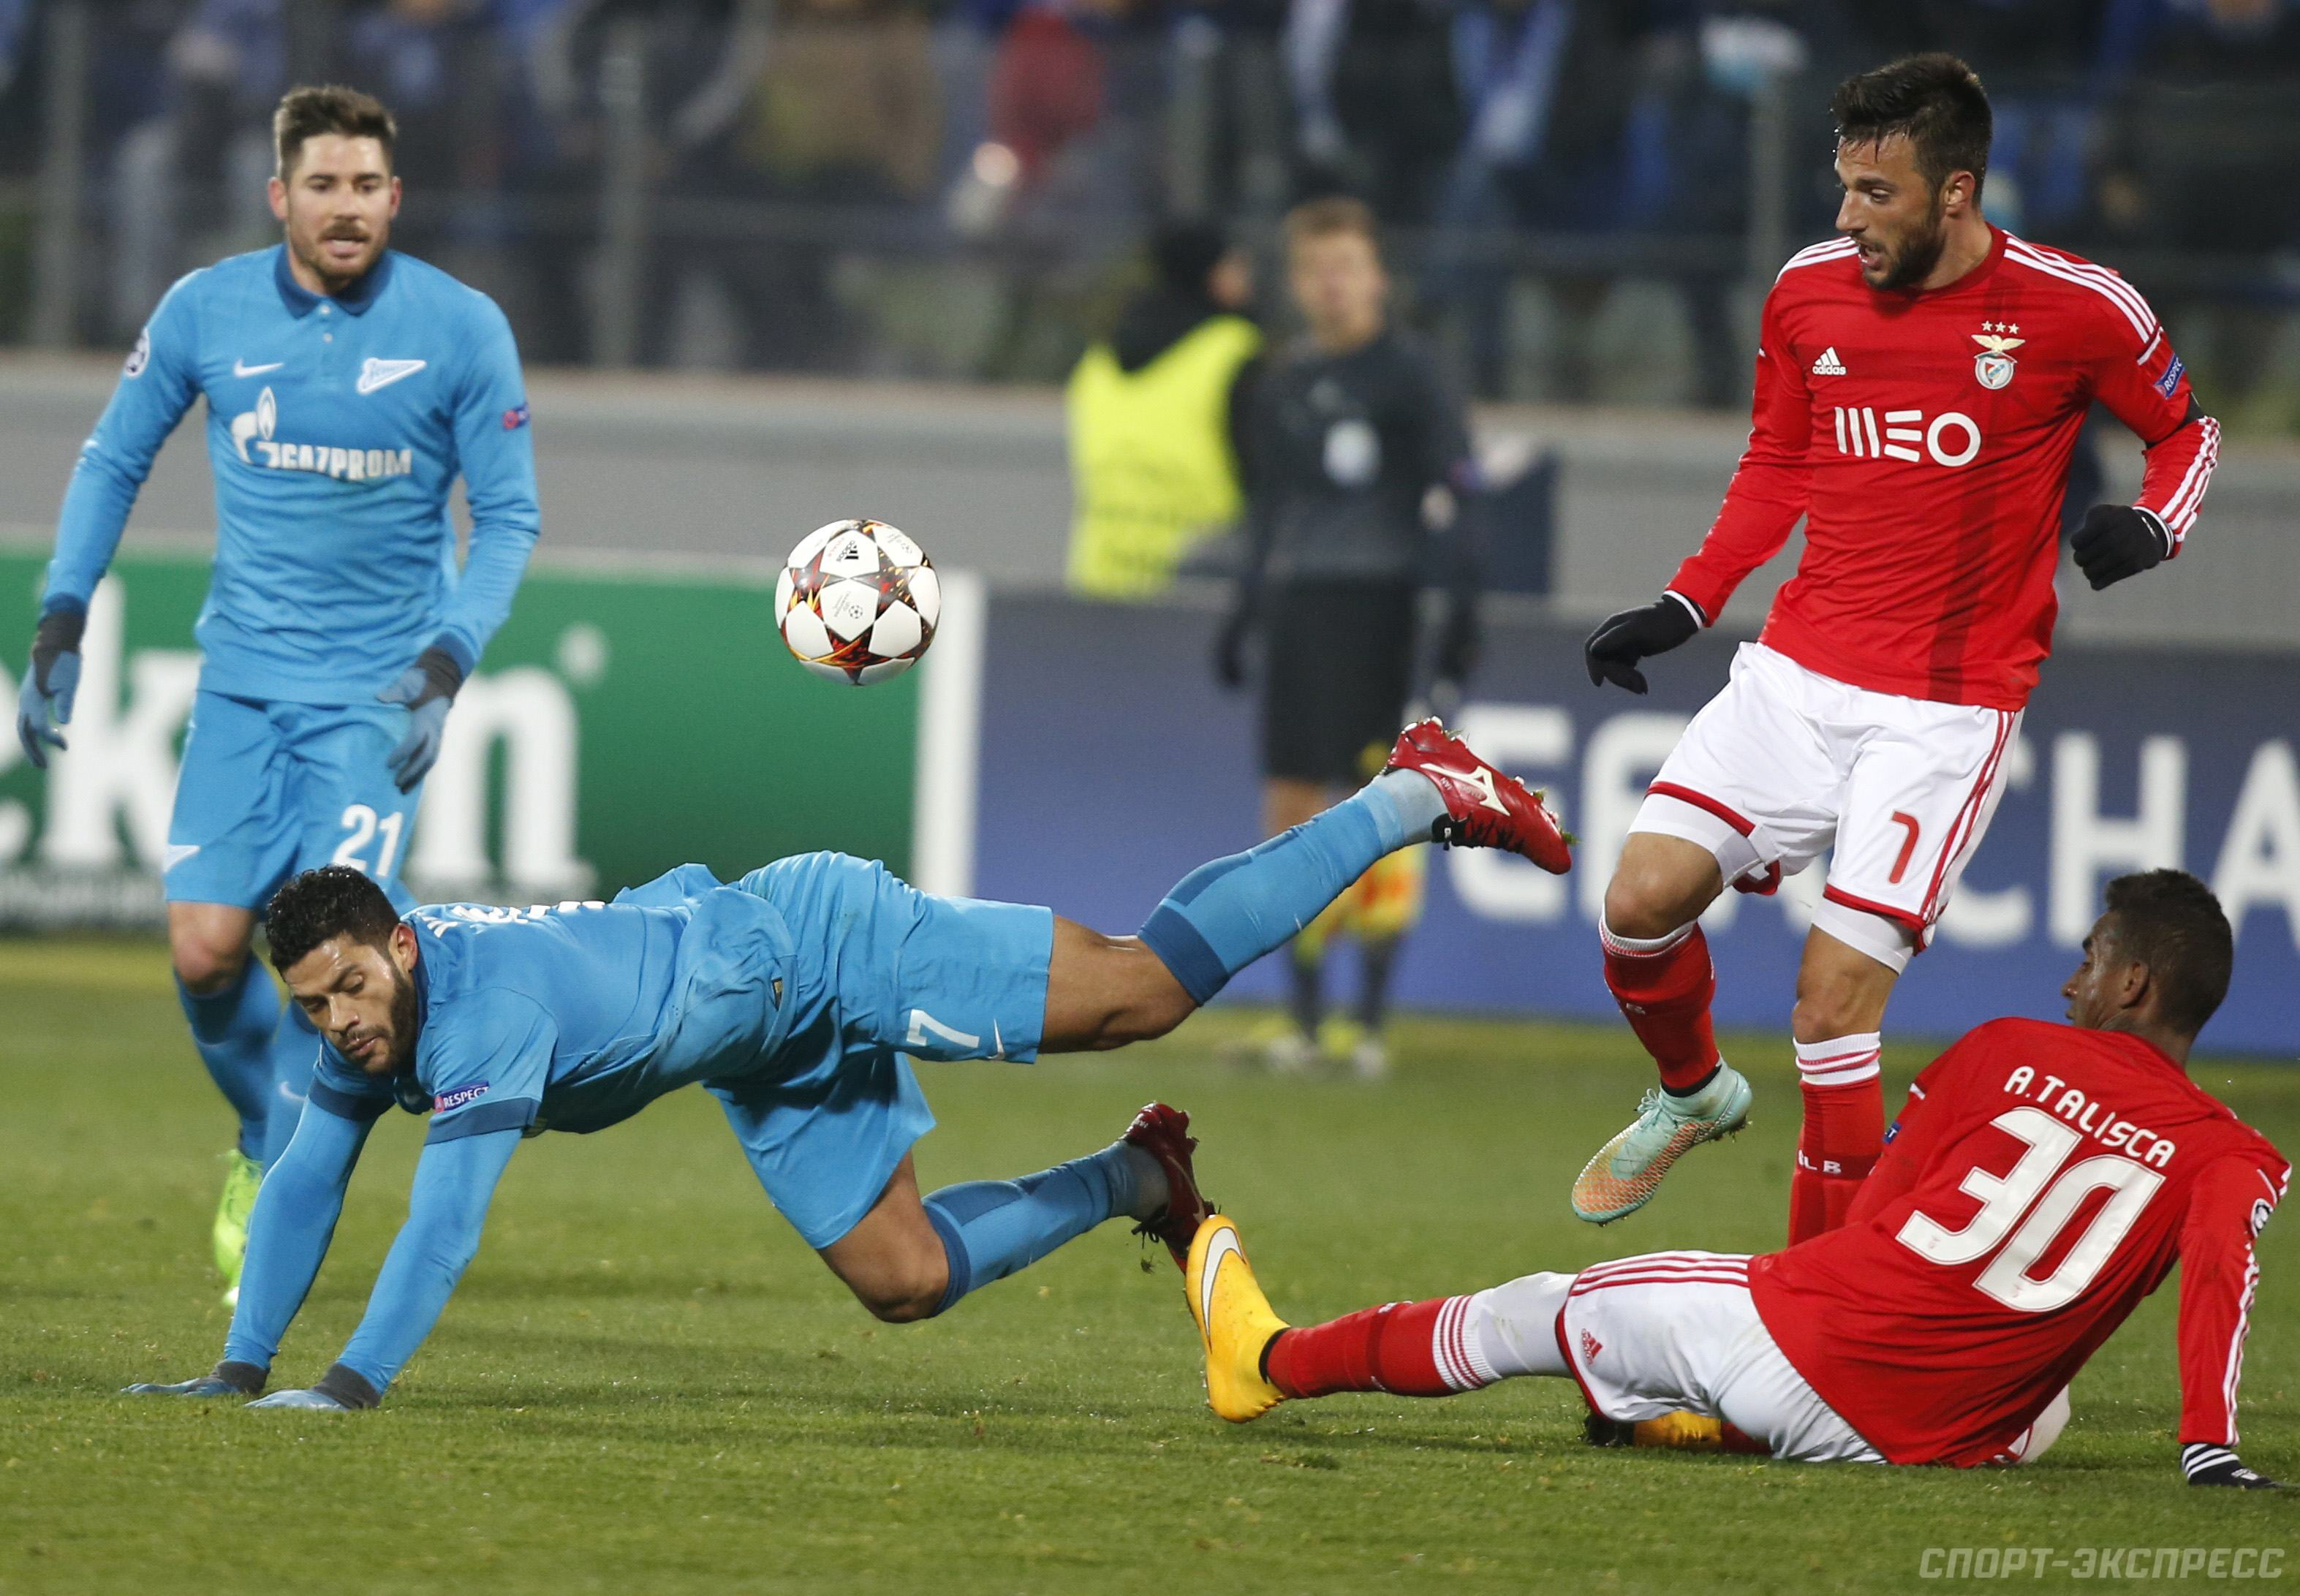 Динамо Киев – Бенфика прогноз на встречу Лиги чемпионов